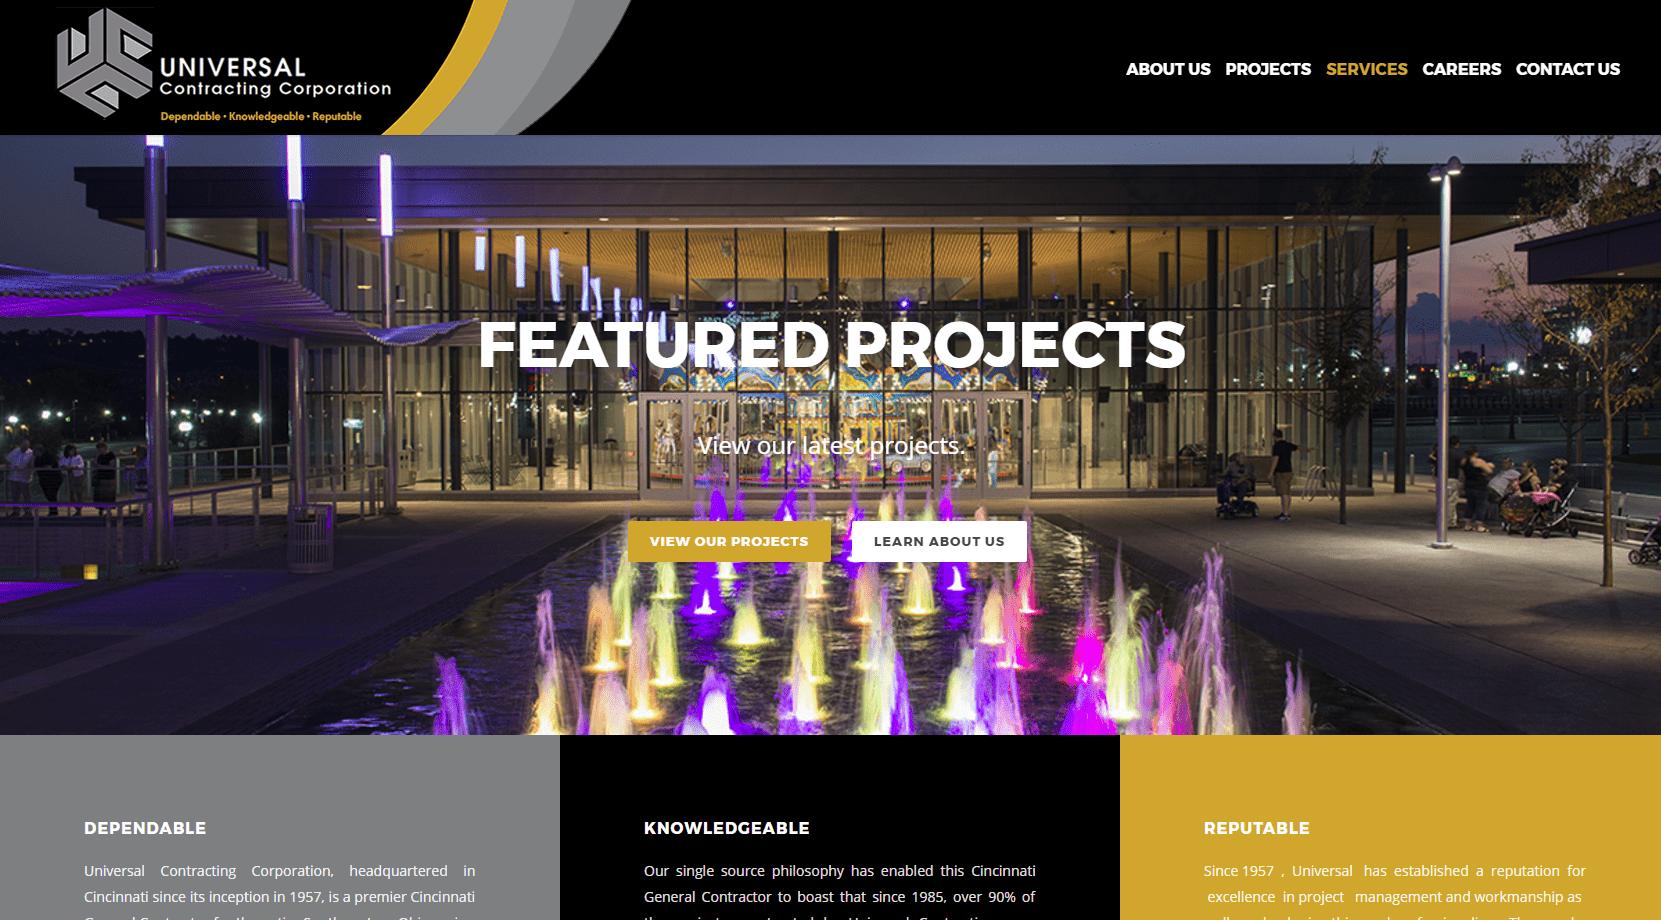 UCC New Website